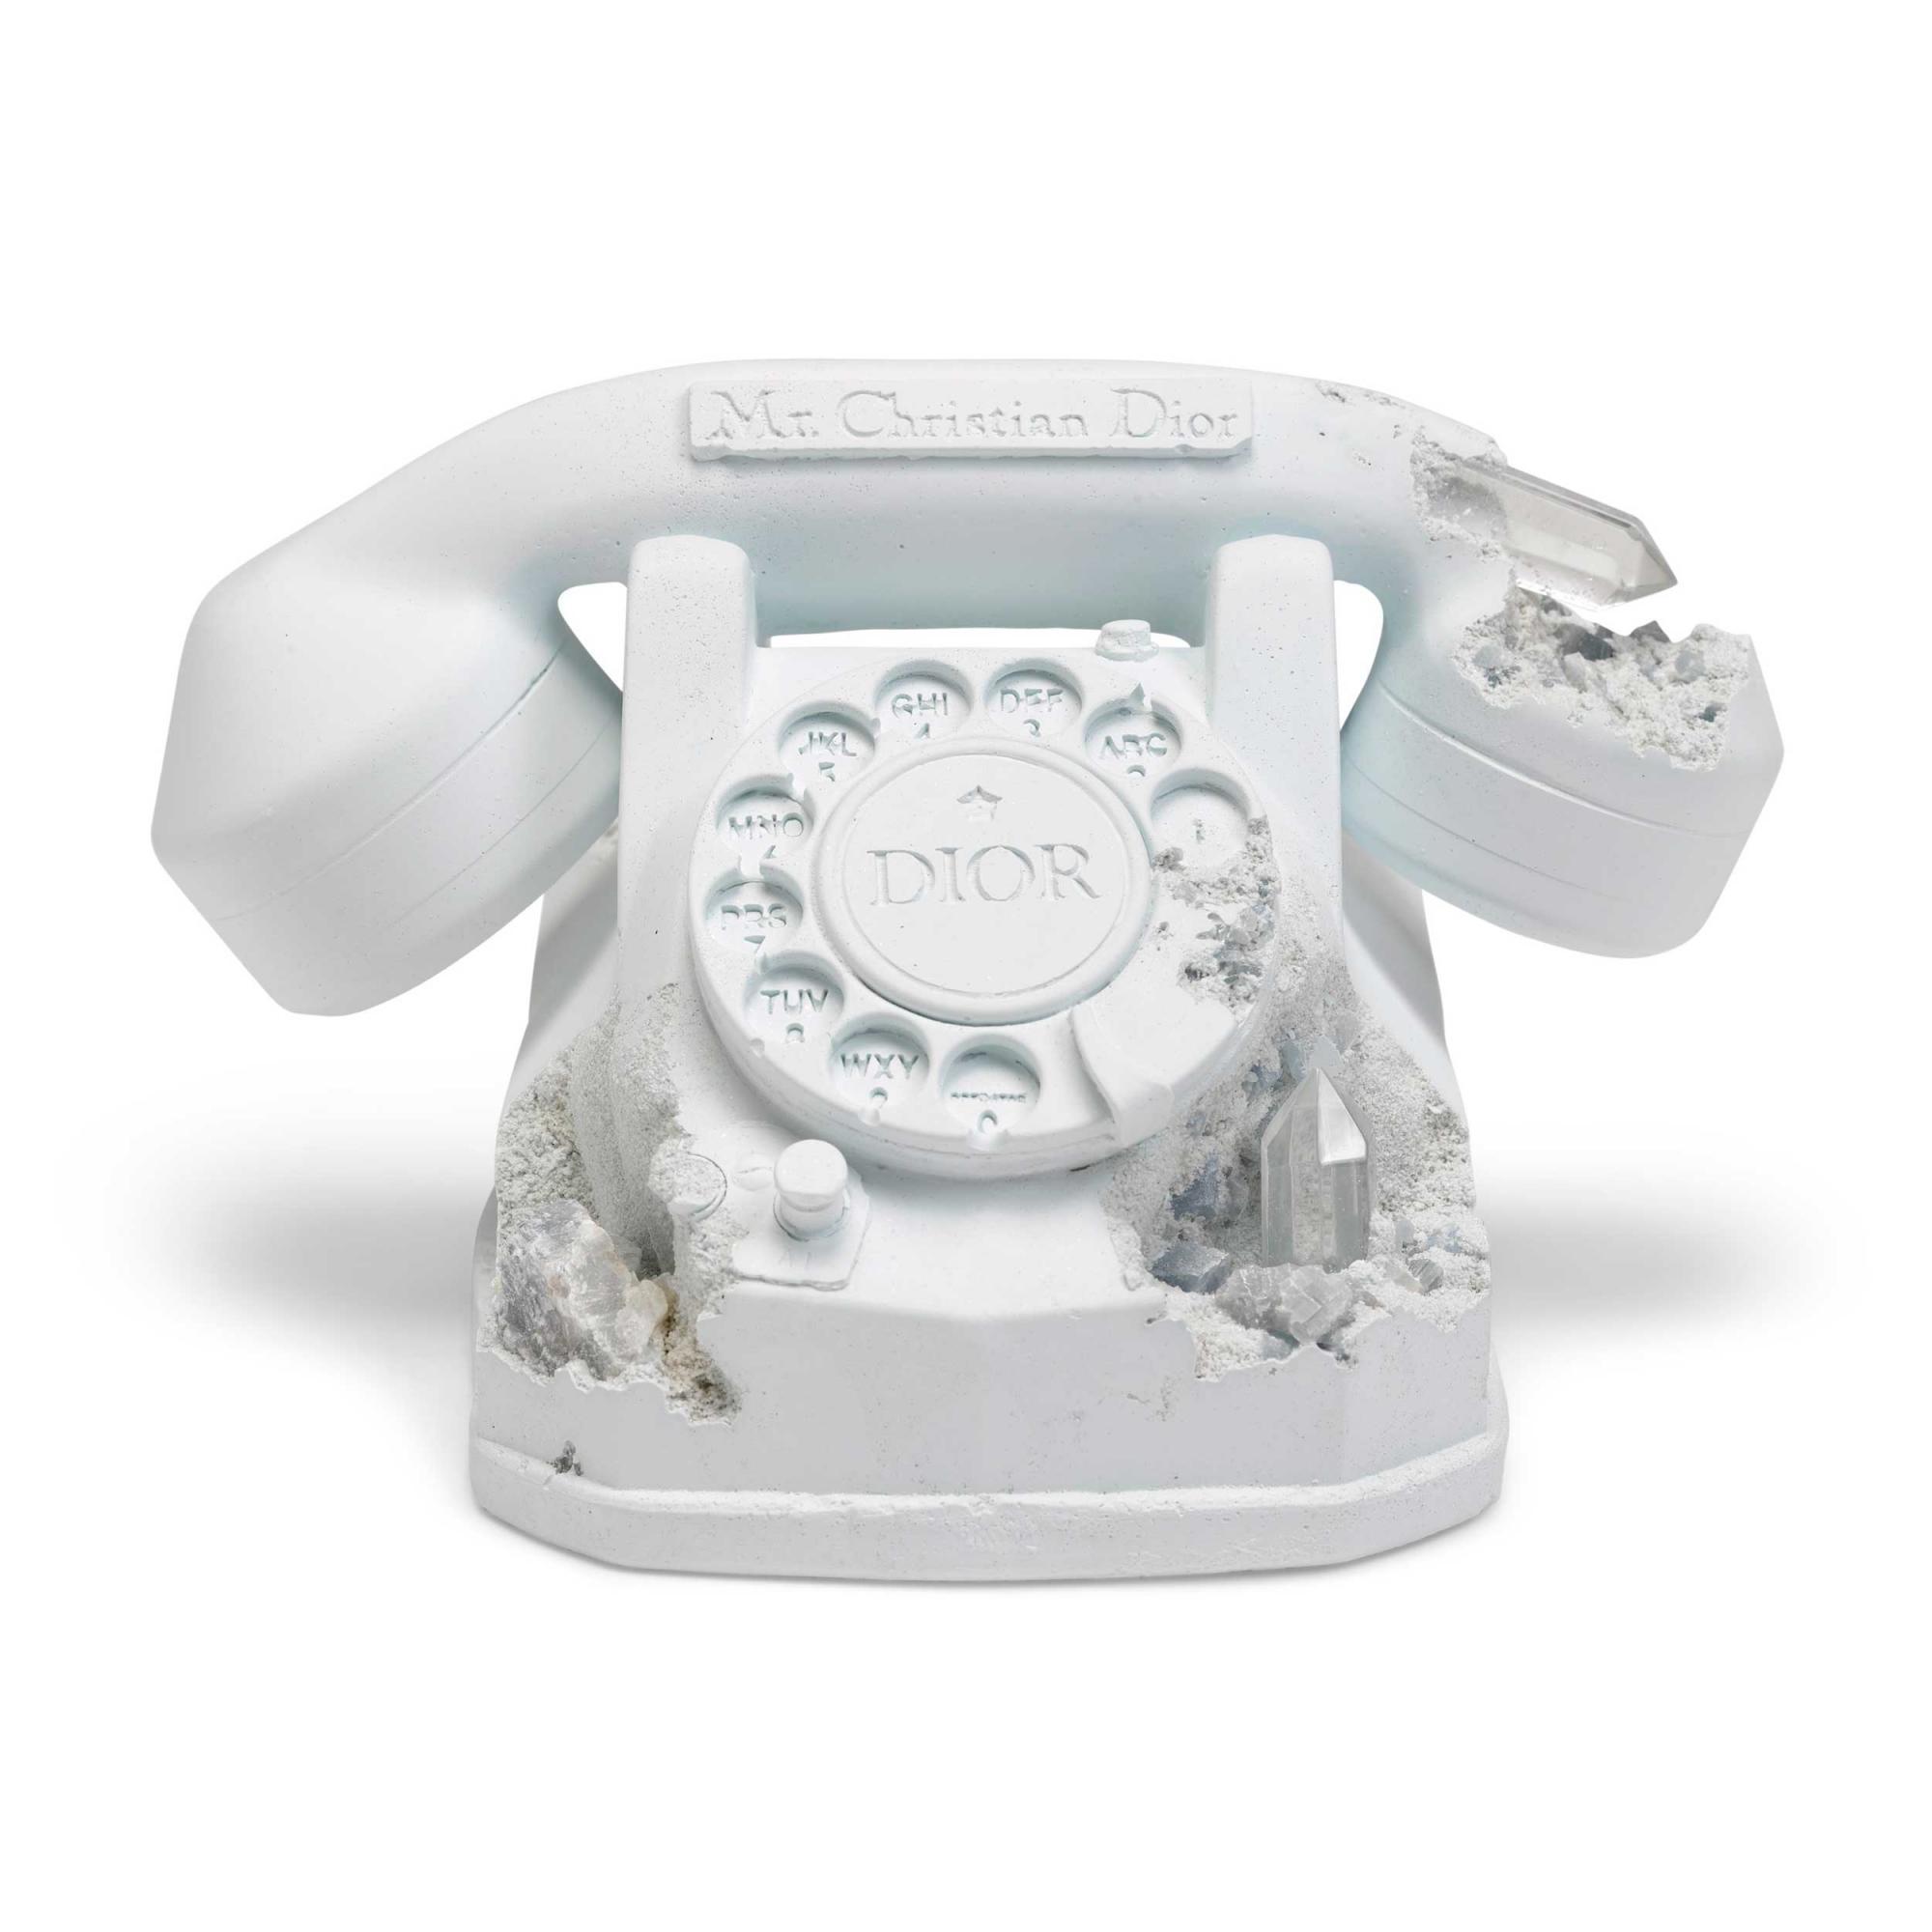 《Future Relic Eroded Telephone》 石膏 石英晶體 雕塑 (附原裝木箱) 14 (高) x 20.3 x 24.2 公分 (5 1/2 x 8 x 9 1/2 吋) 2020年作 版數:147/250 估價:港元90,000 – 130,000